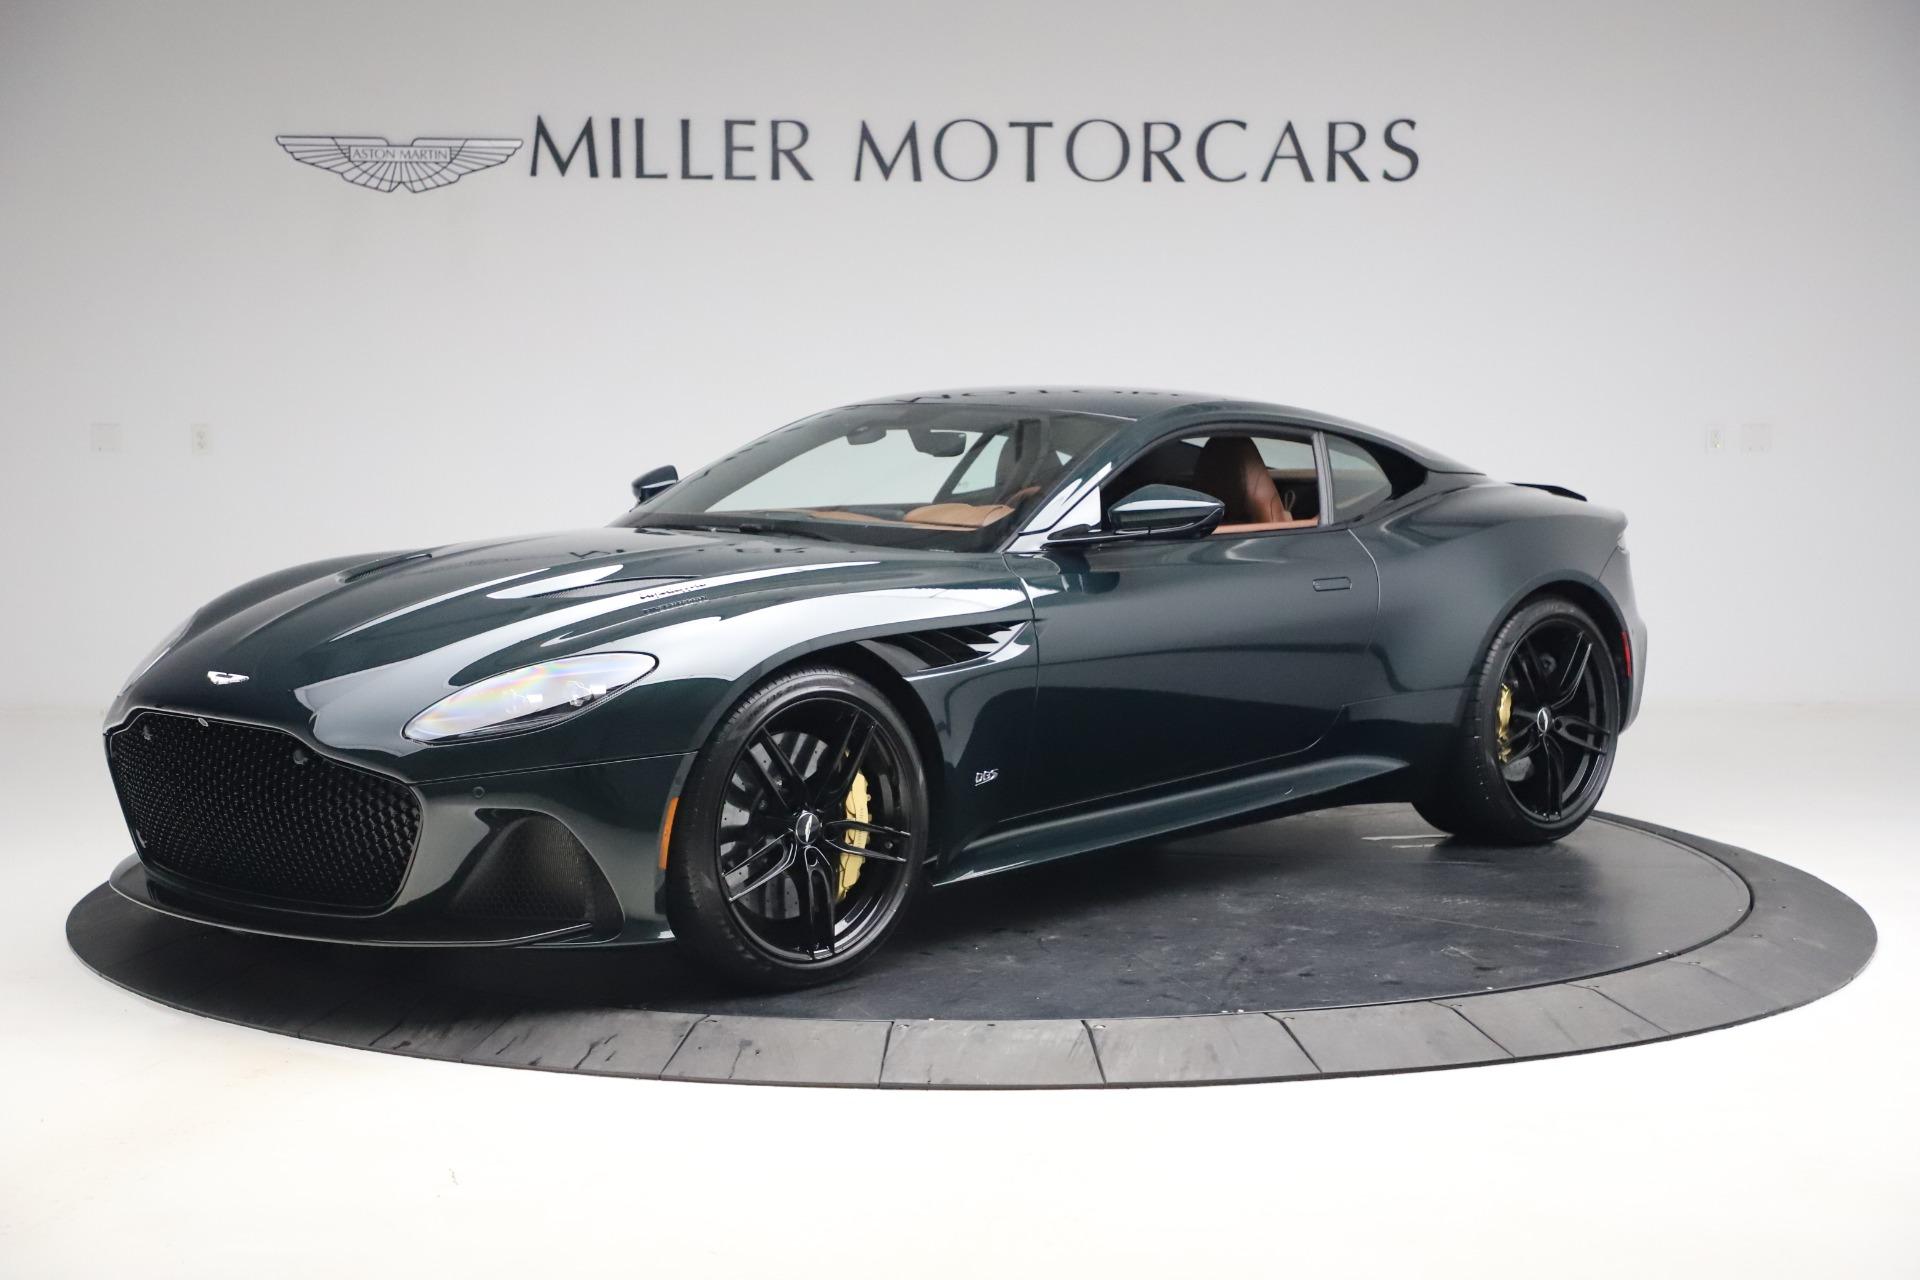 Used 2020 Aston Martin DBS Superleggera for sale $295,900 at Bugatti of Greenwich in Greenwich CT 06830 1